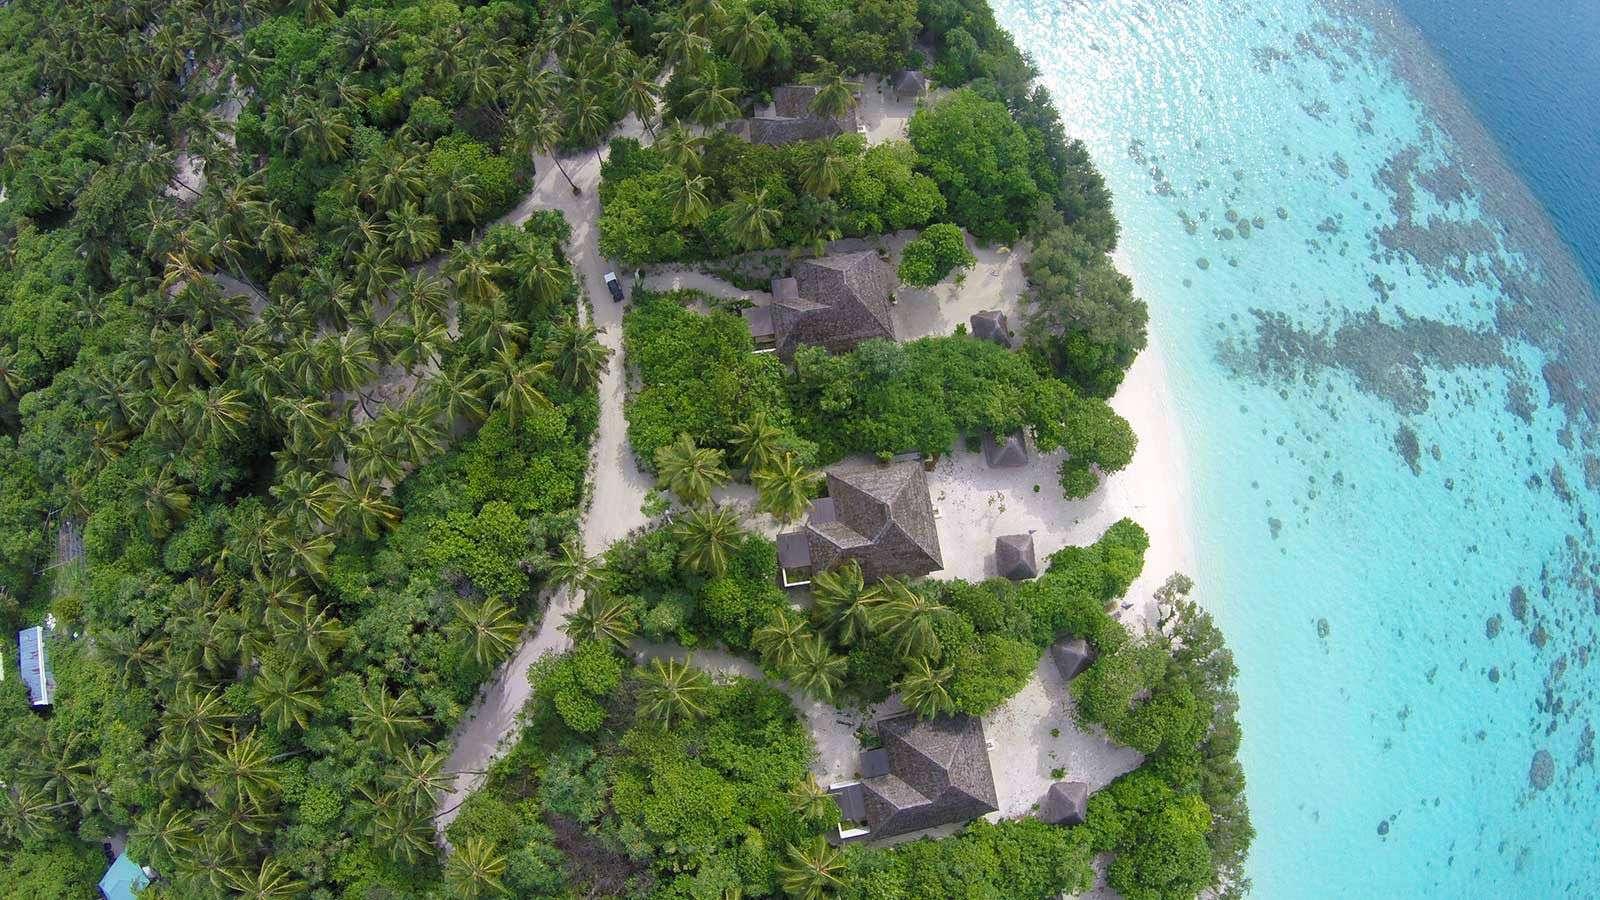 Luxury villa rentals asia - Maldives - Dhonakulhi island - Hideaway beachresortandspa - Sunset Beach Villa - Image 1/6